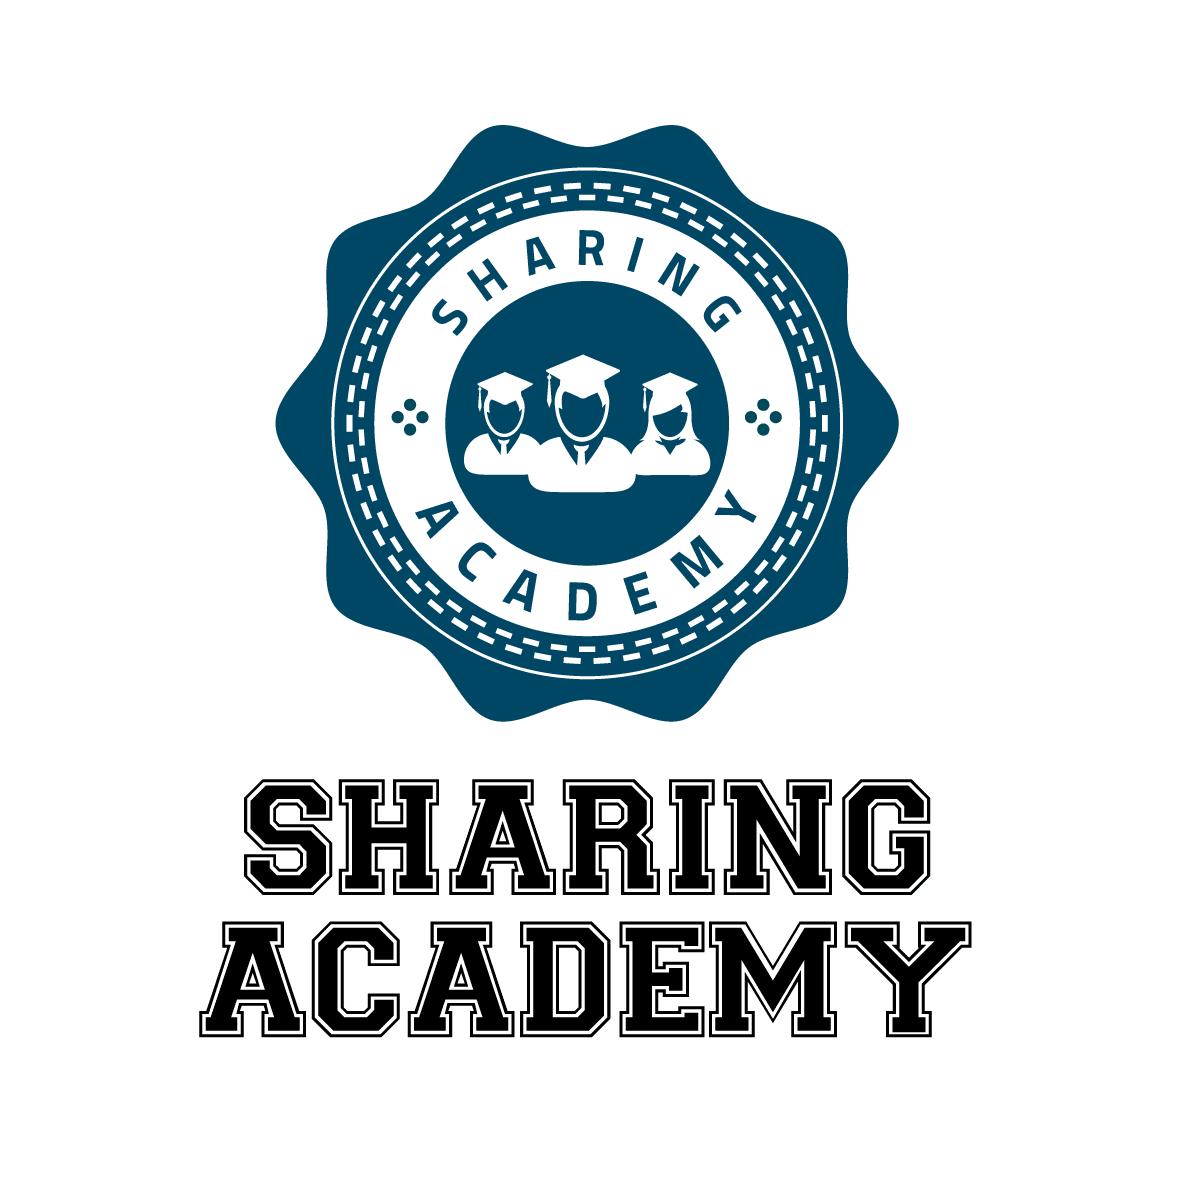 http://sharingacademy.com/